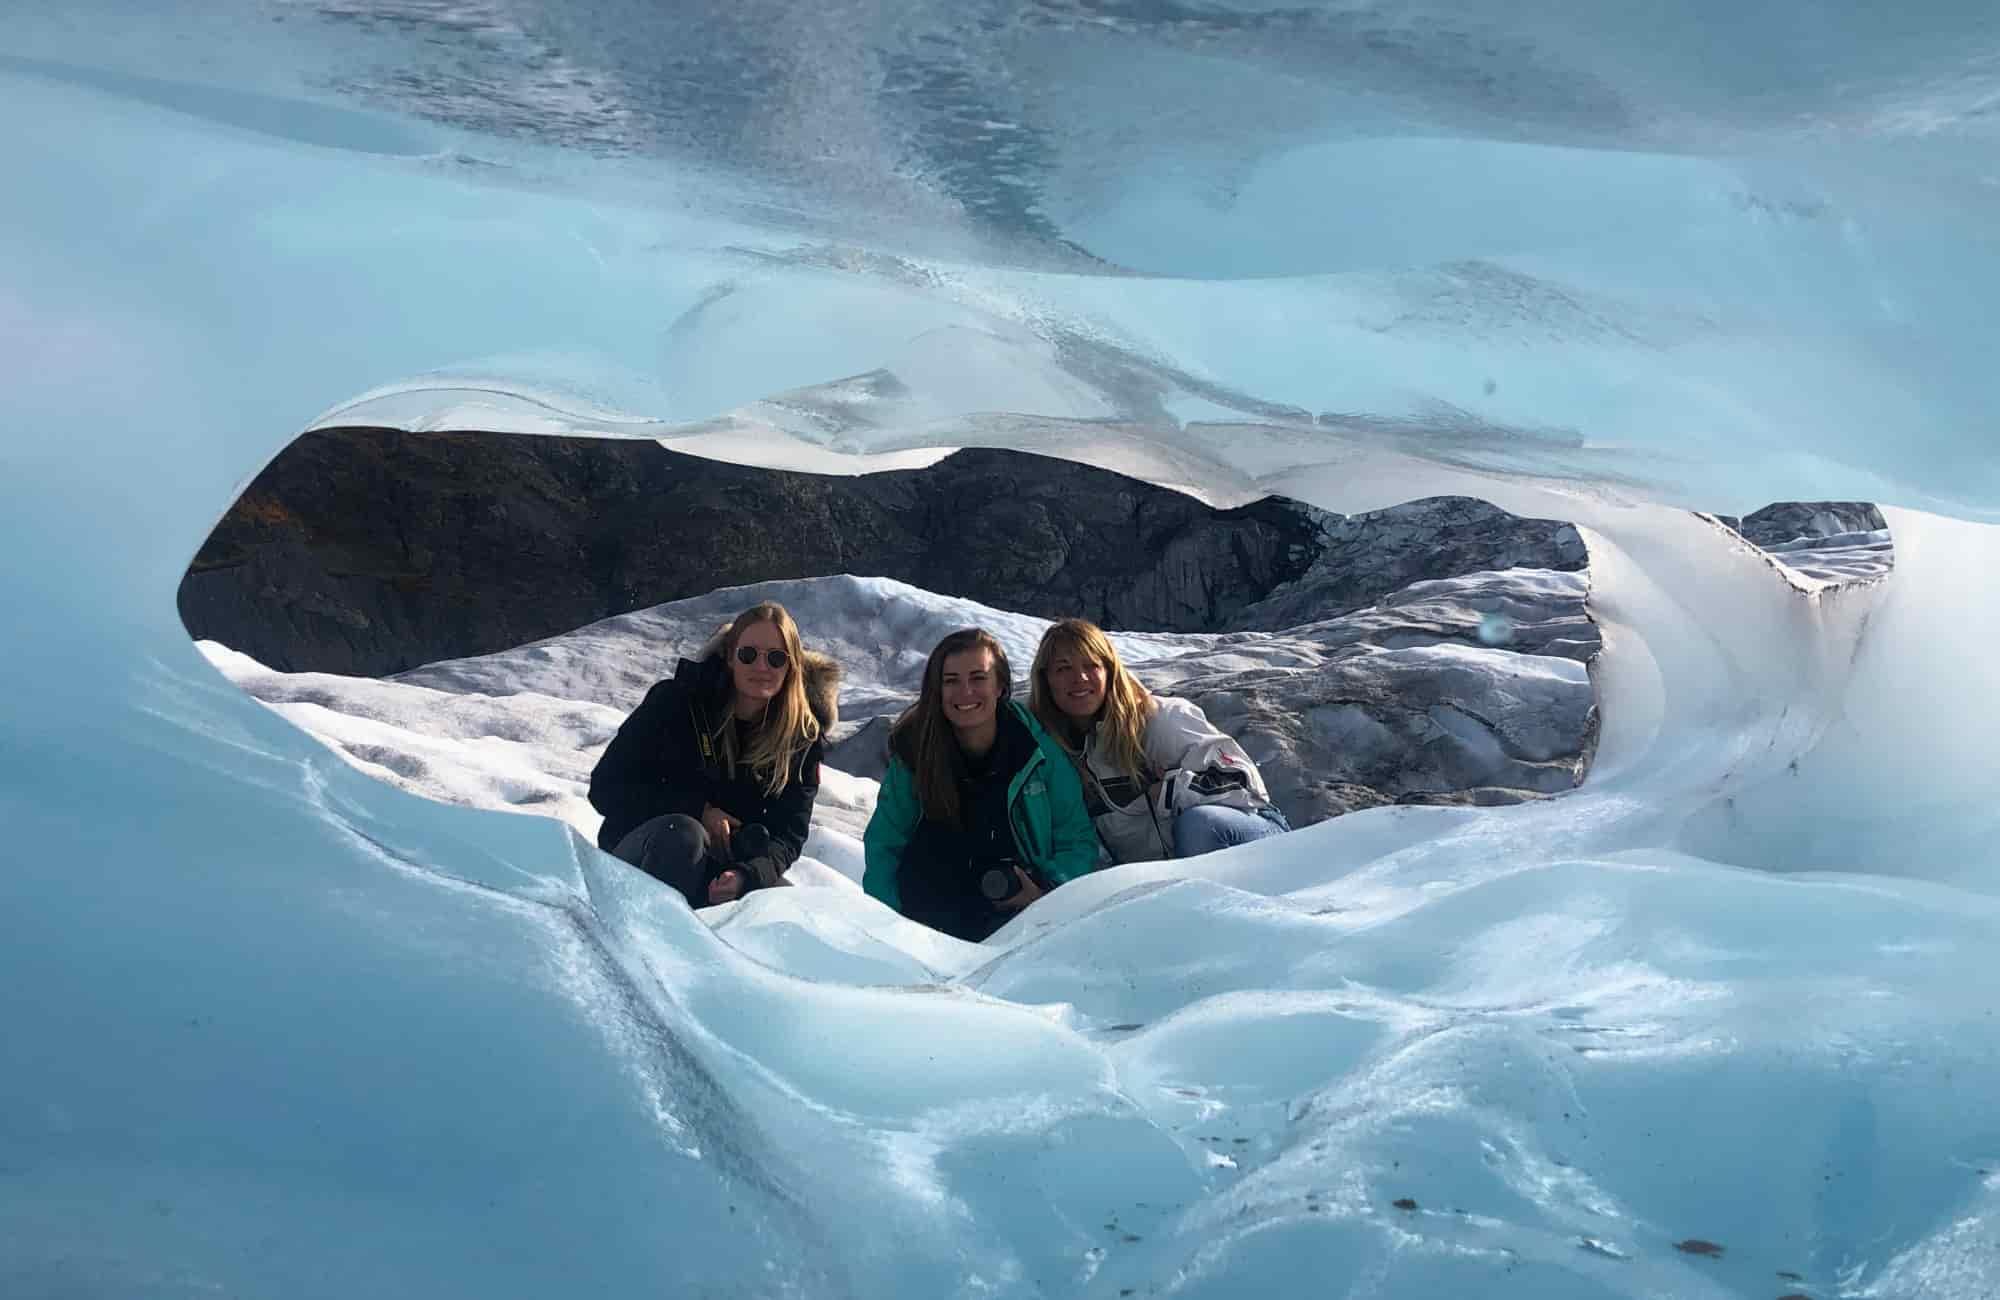 Voyage Alaska - Randonnée sur la glacier - Amplitudes